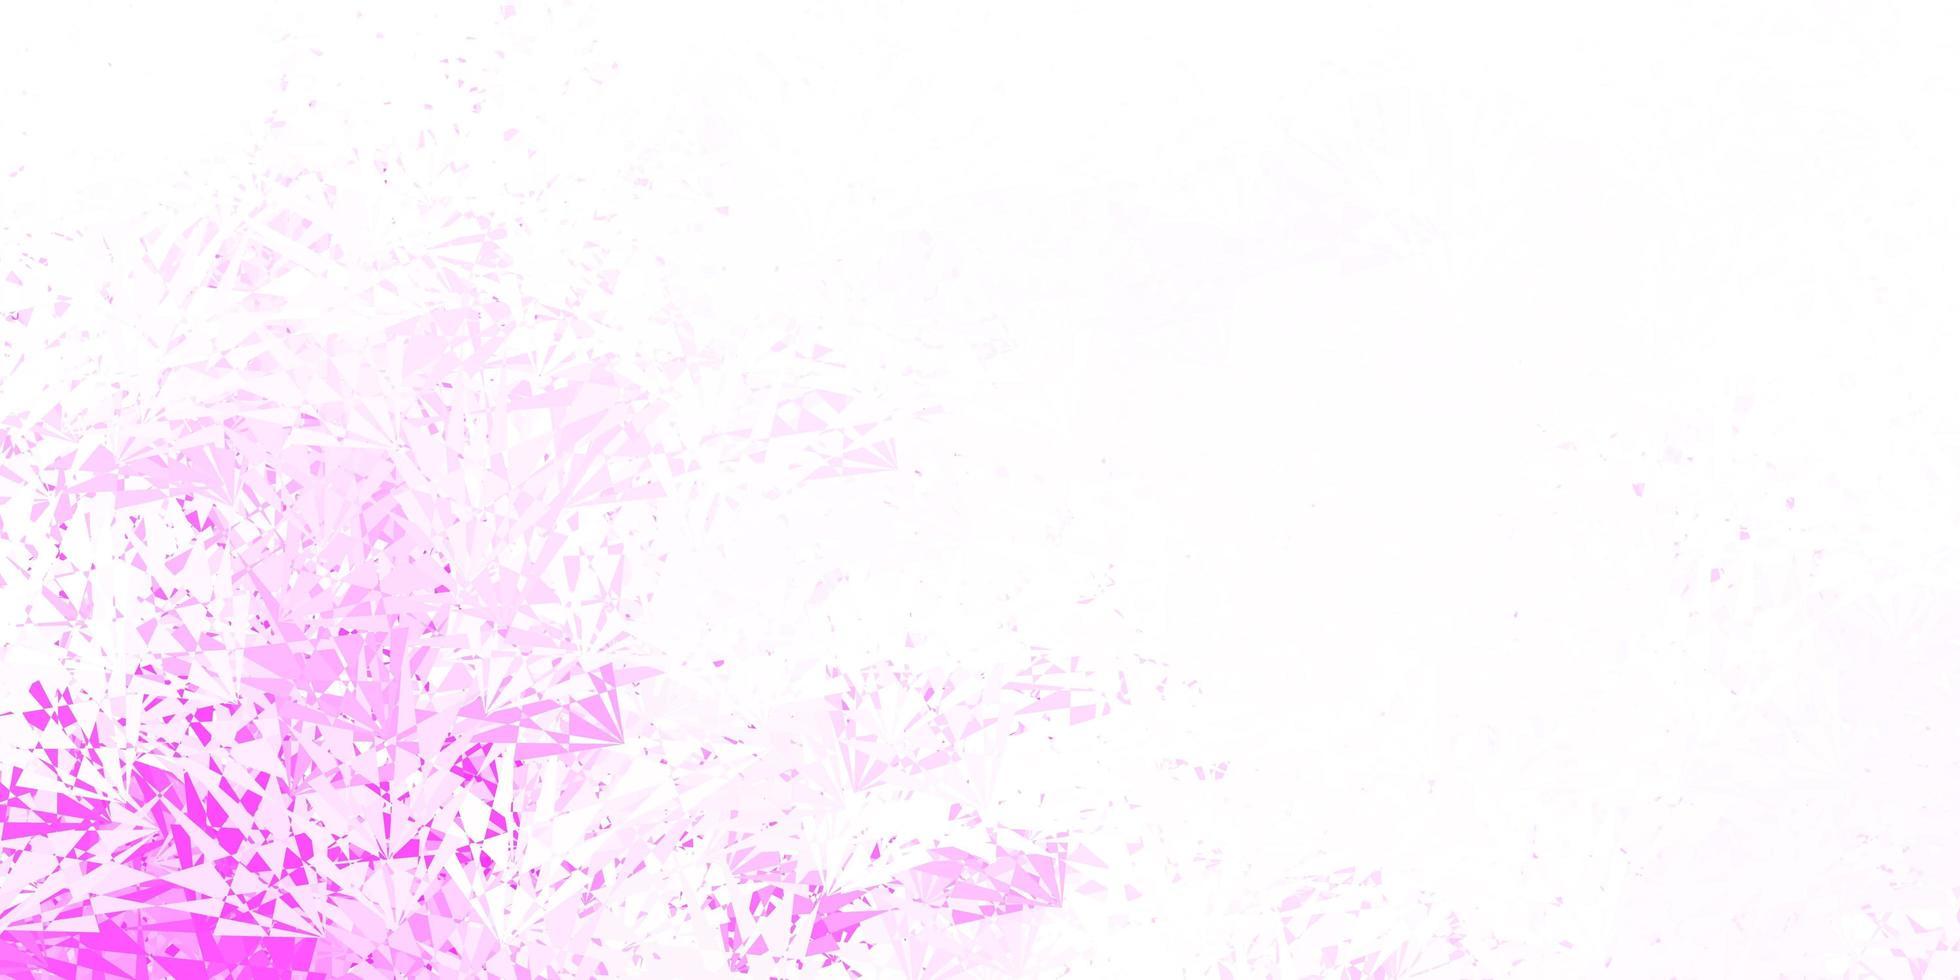 hellrosa Vektorhintergrund mit polygonalen Formen. vektor